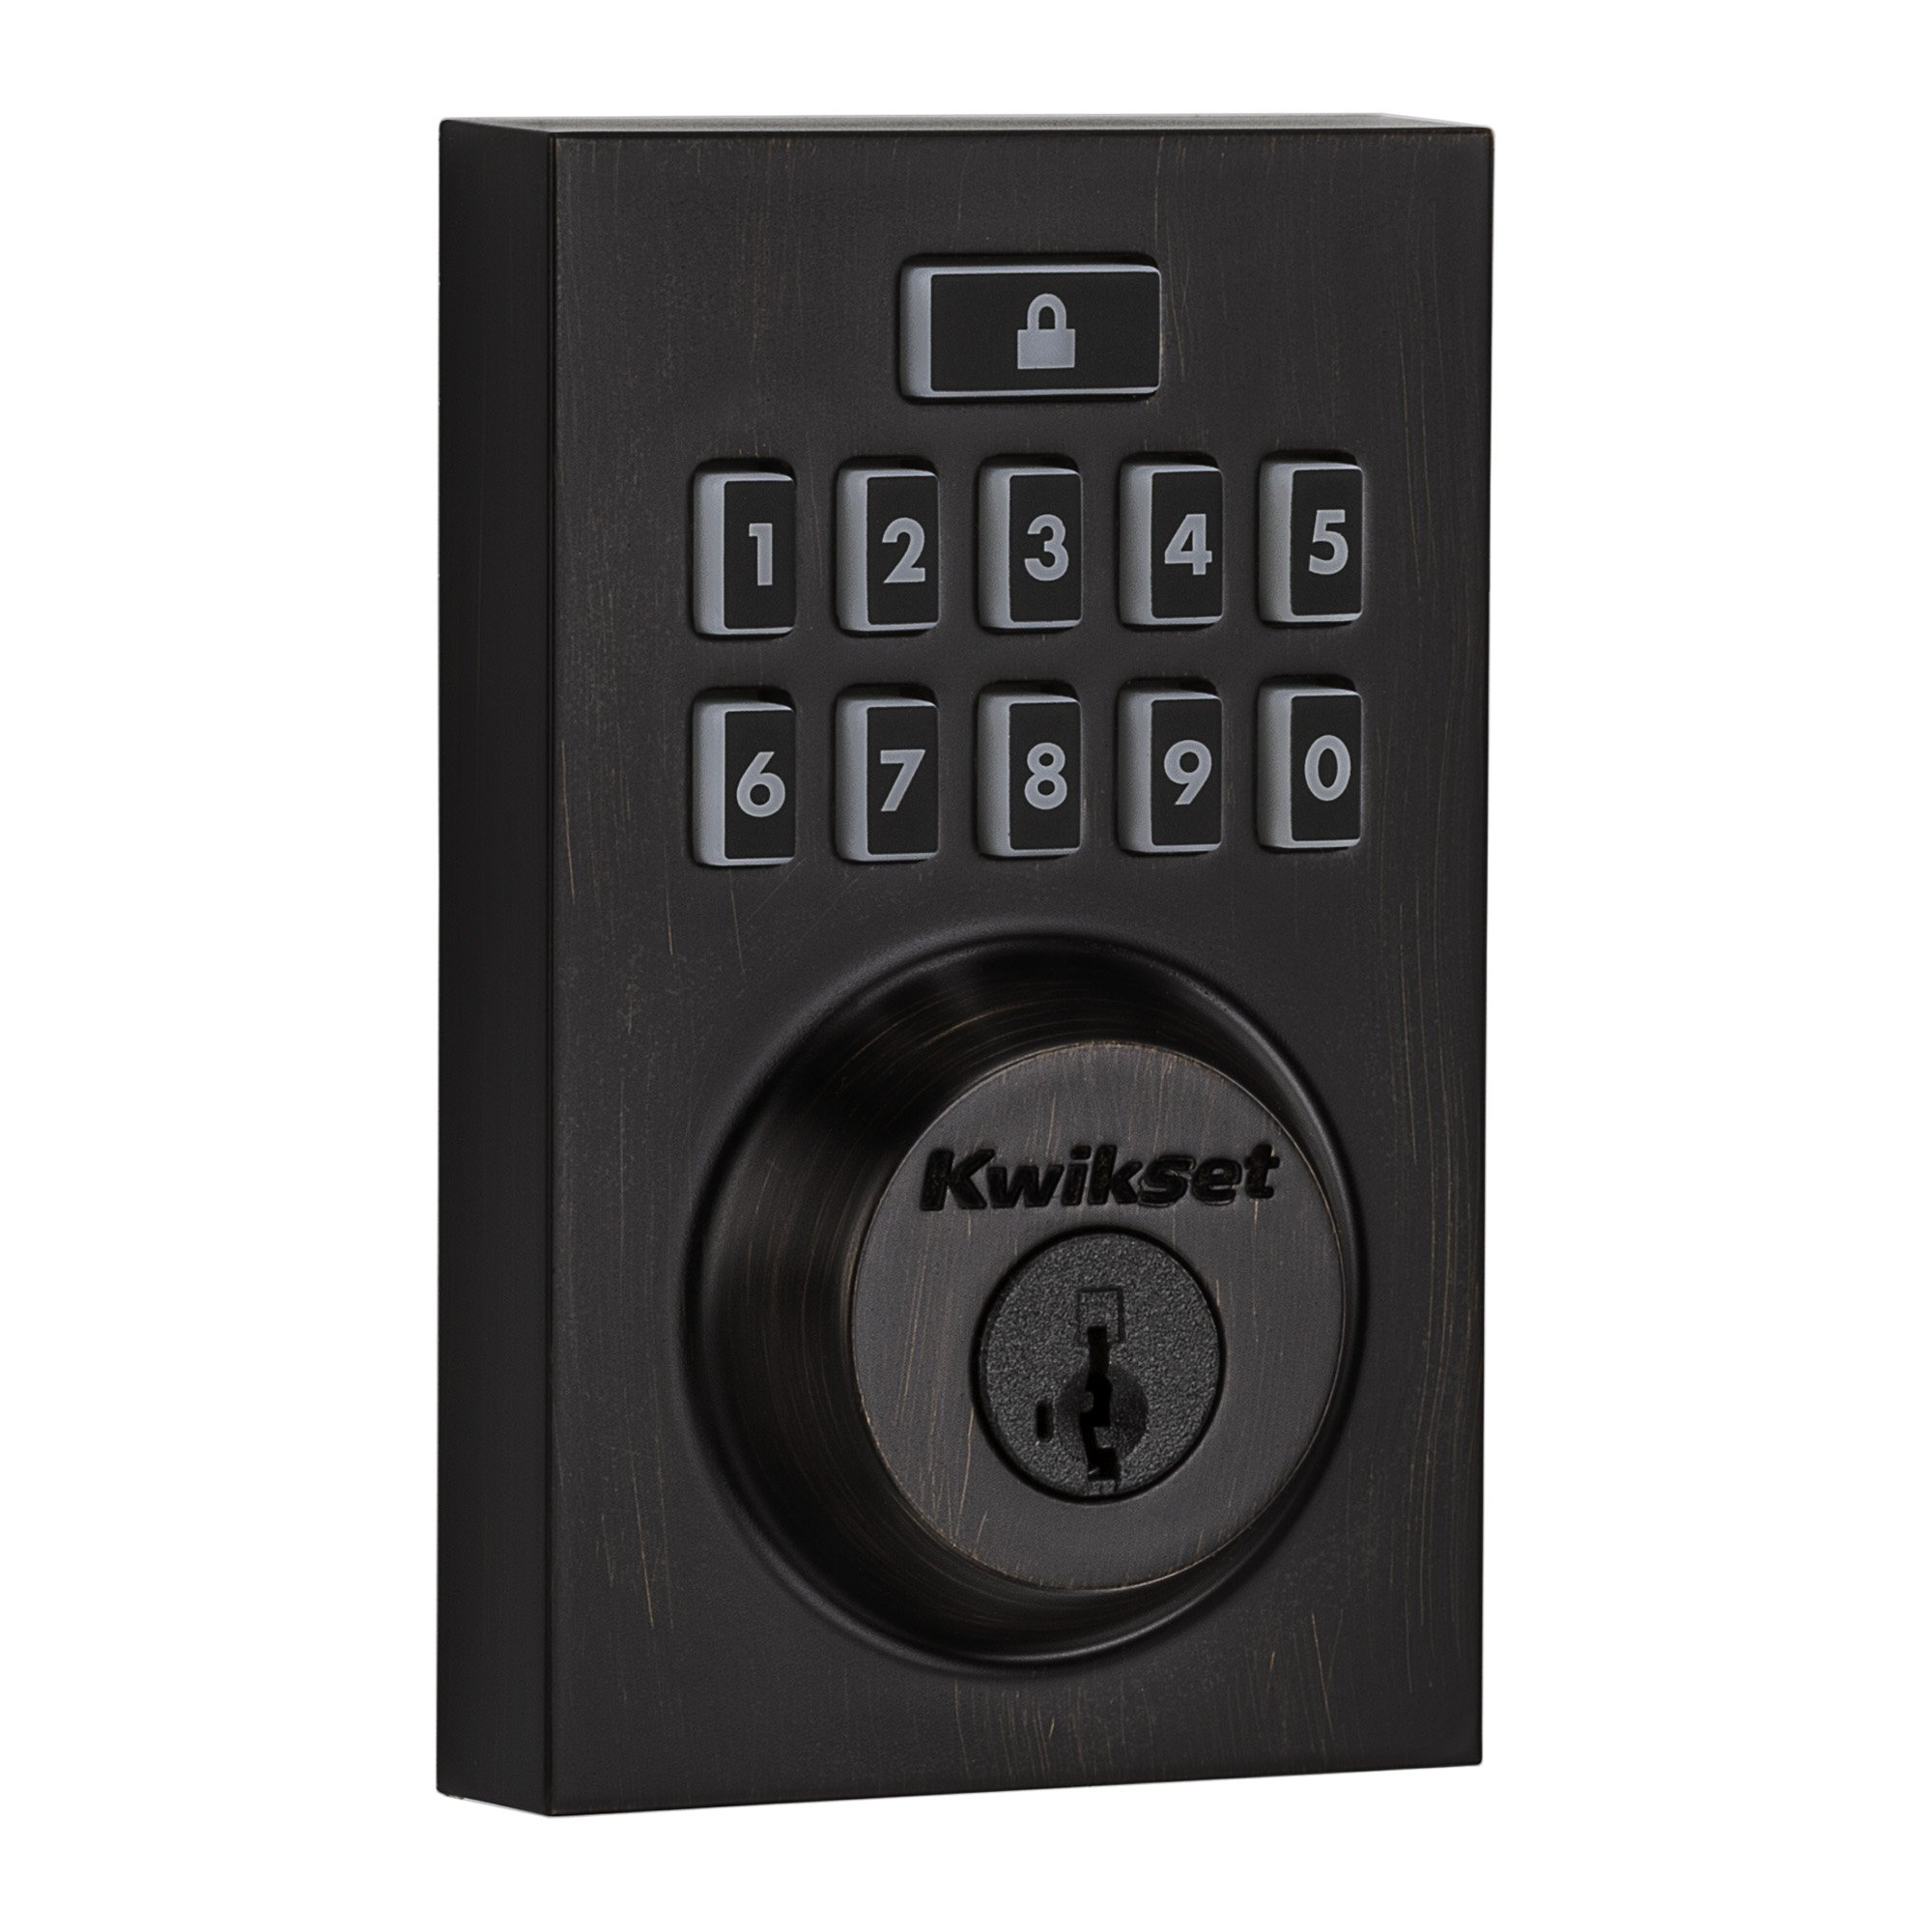 Kwikset Smartcode 913 Contemporary Electronic Deadbolt Featuring Smartkey In Venetian Bronze by Kwikset